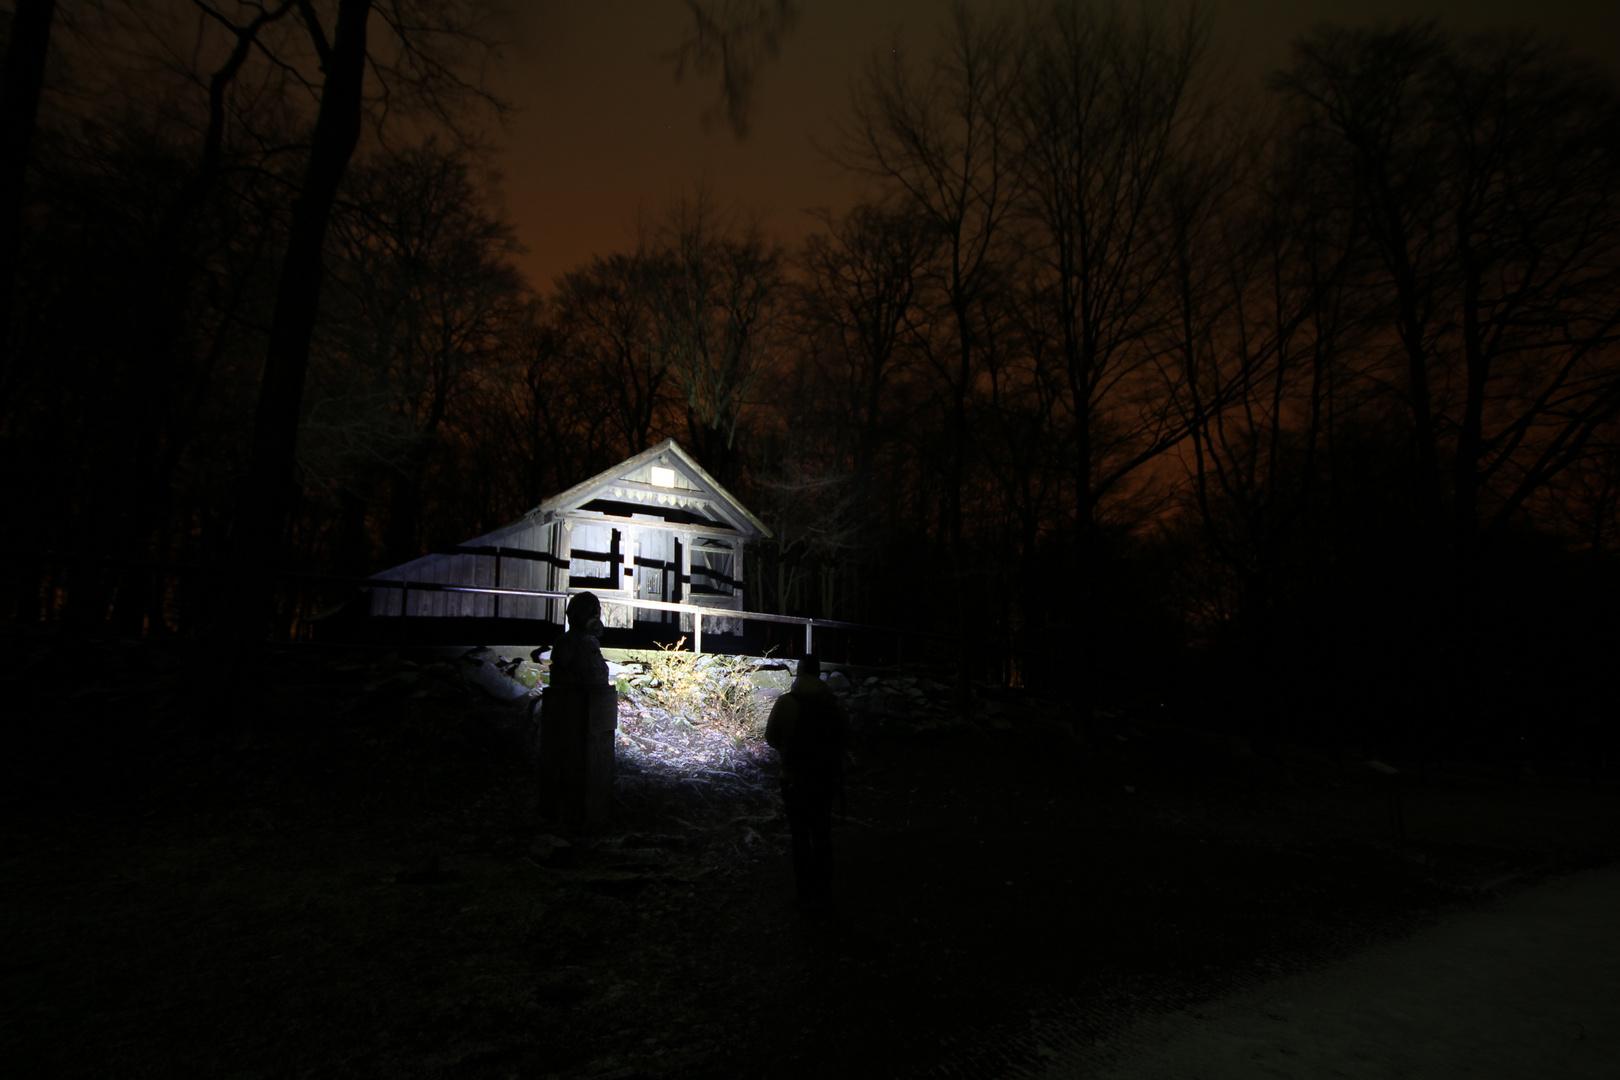 Die Hütte und die Lampe